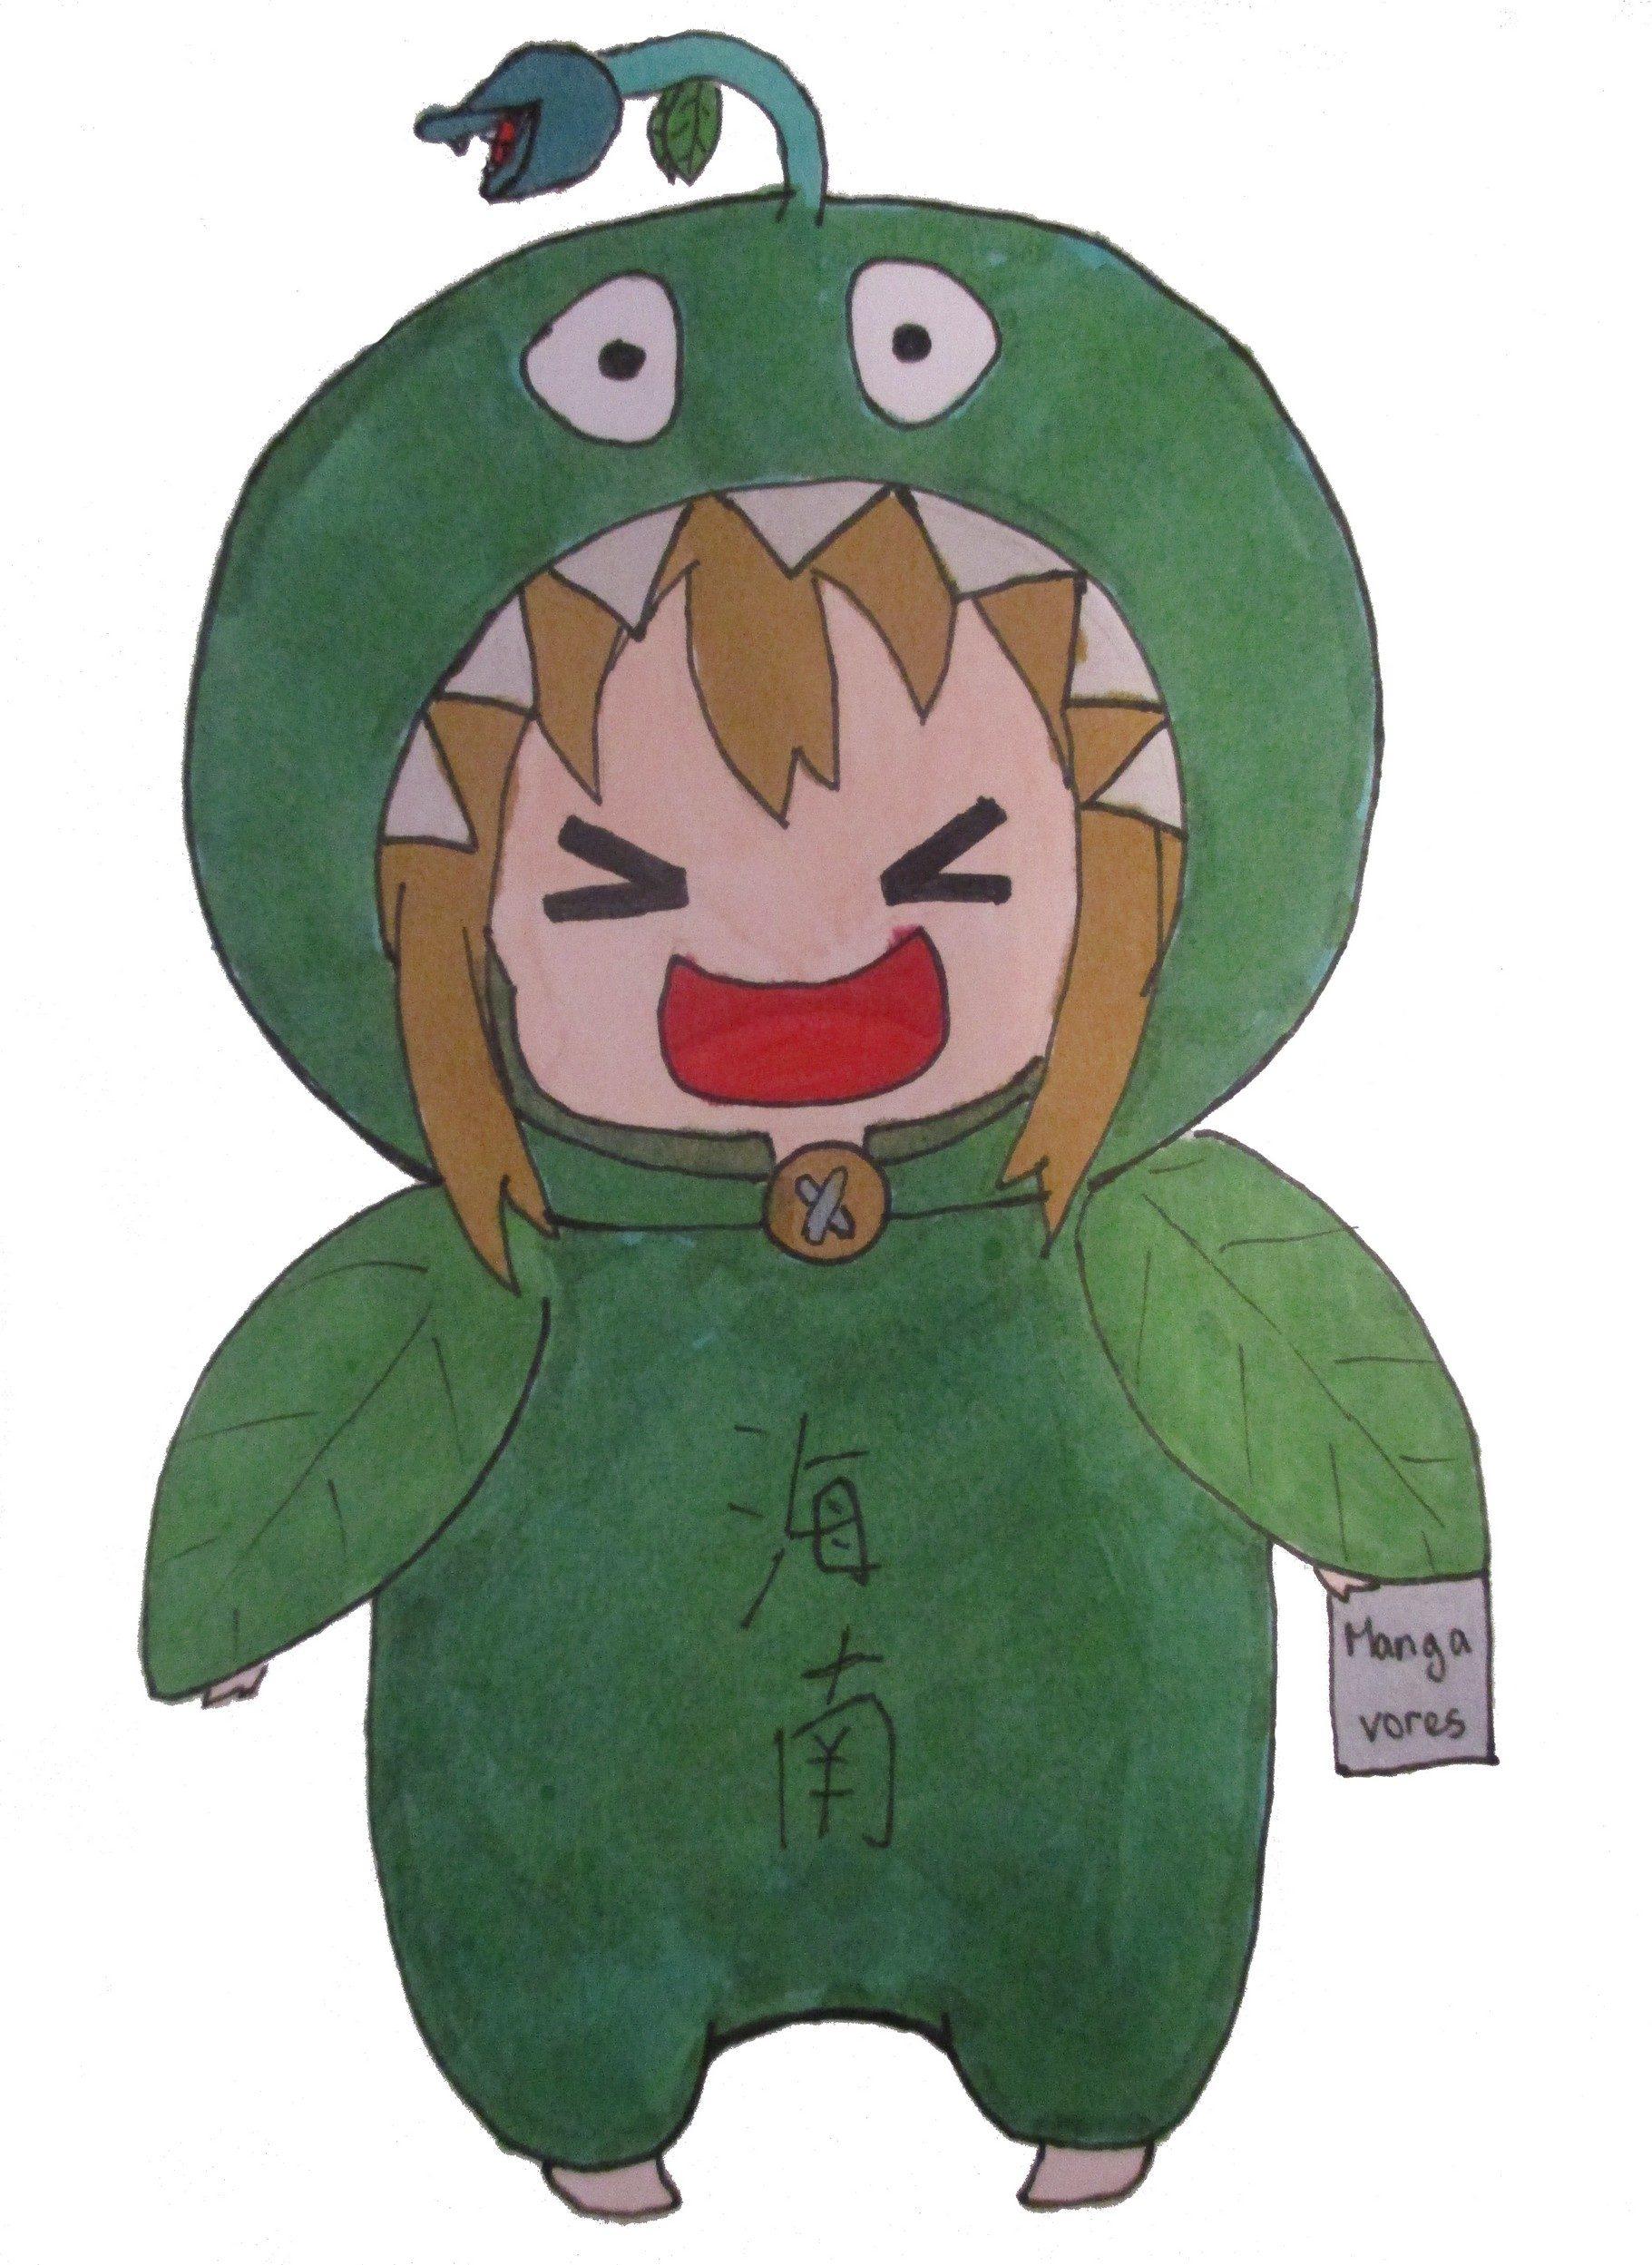 Manga'vores 3.jpg